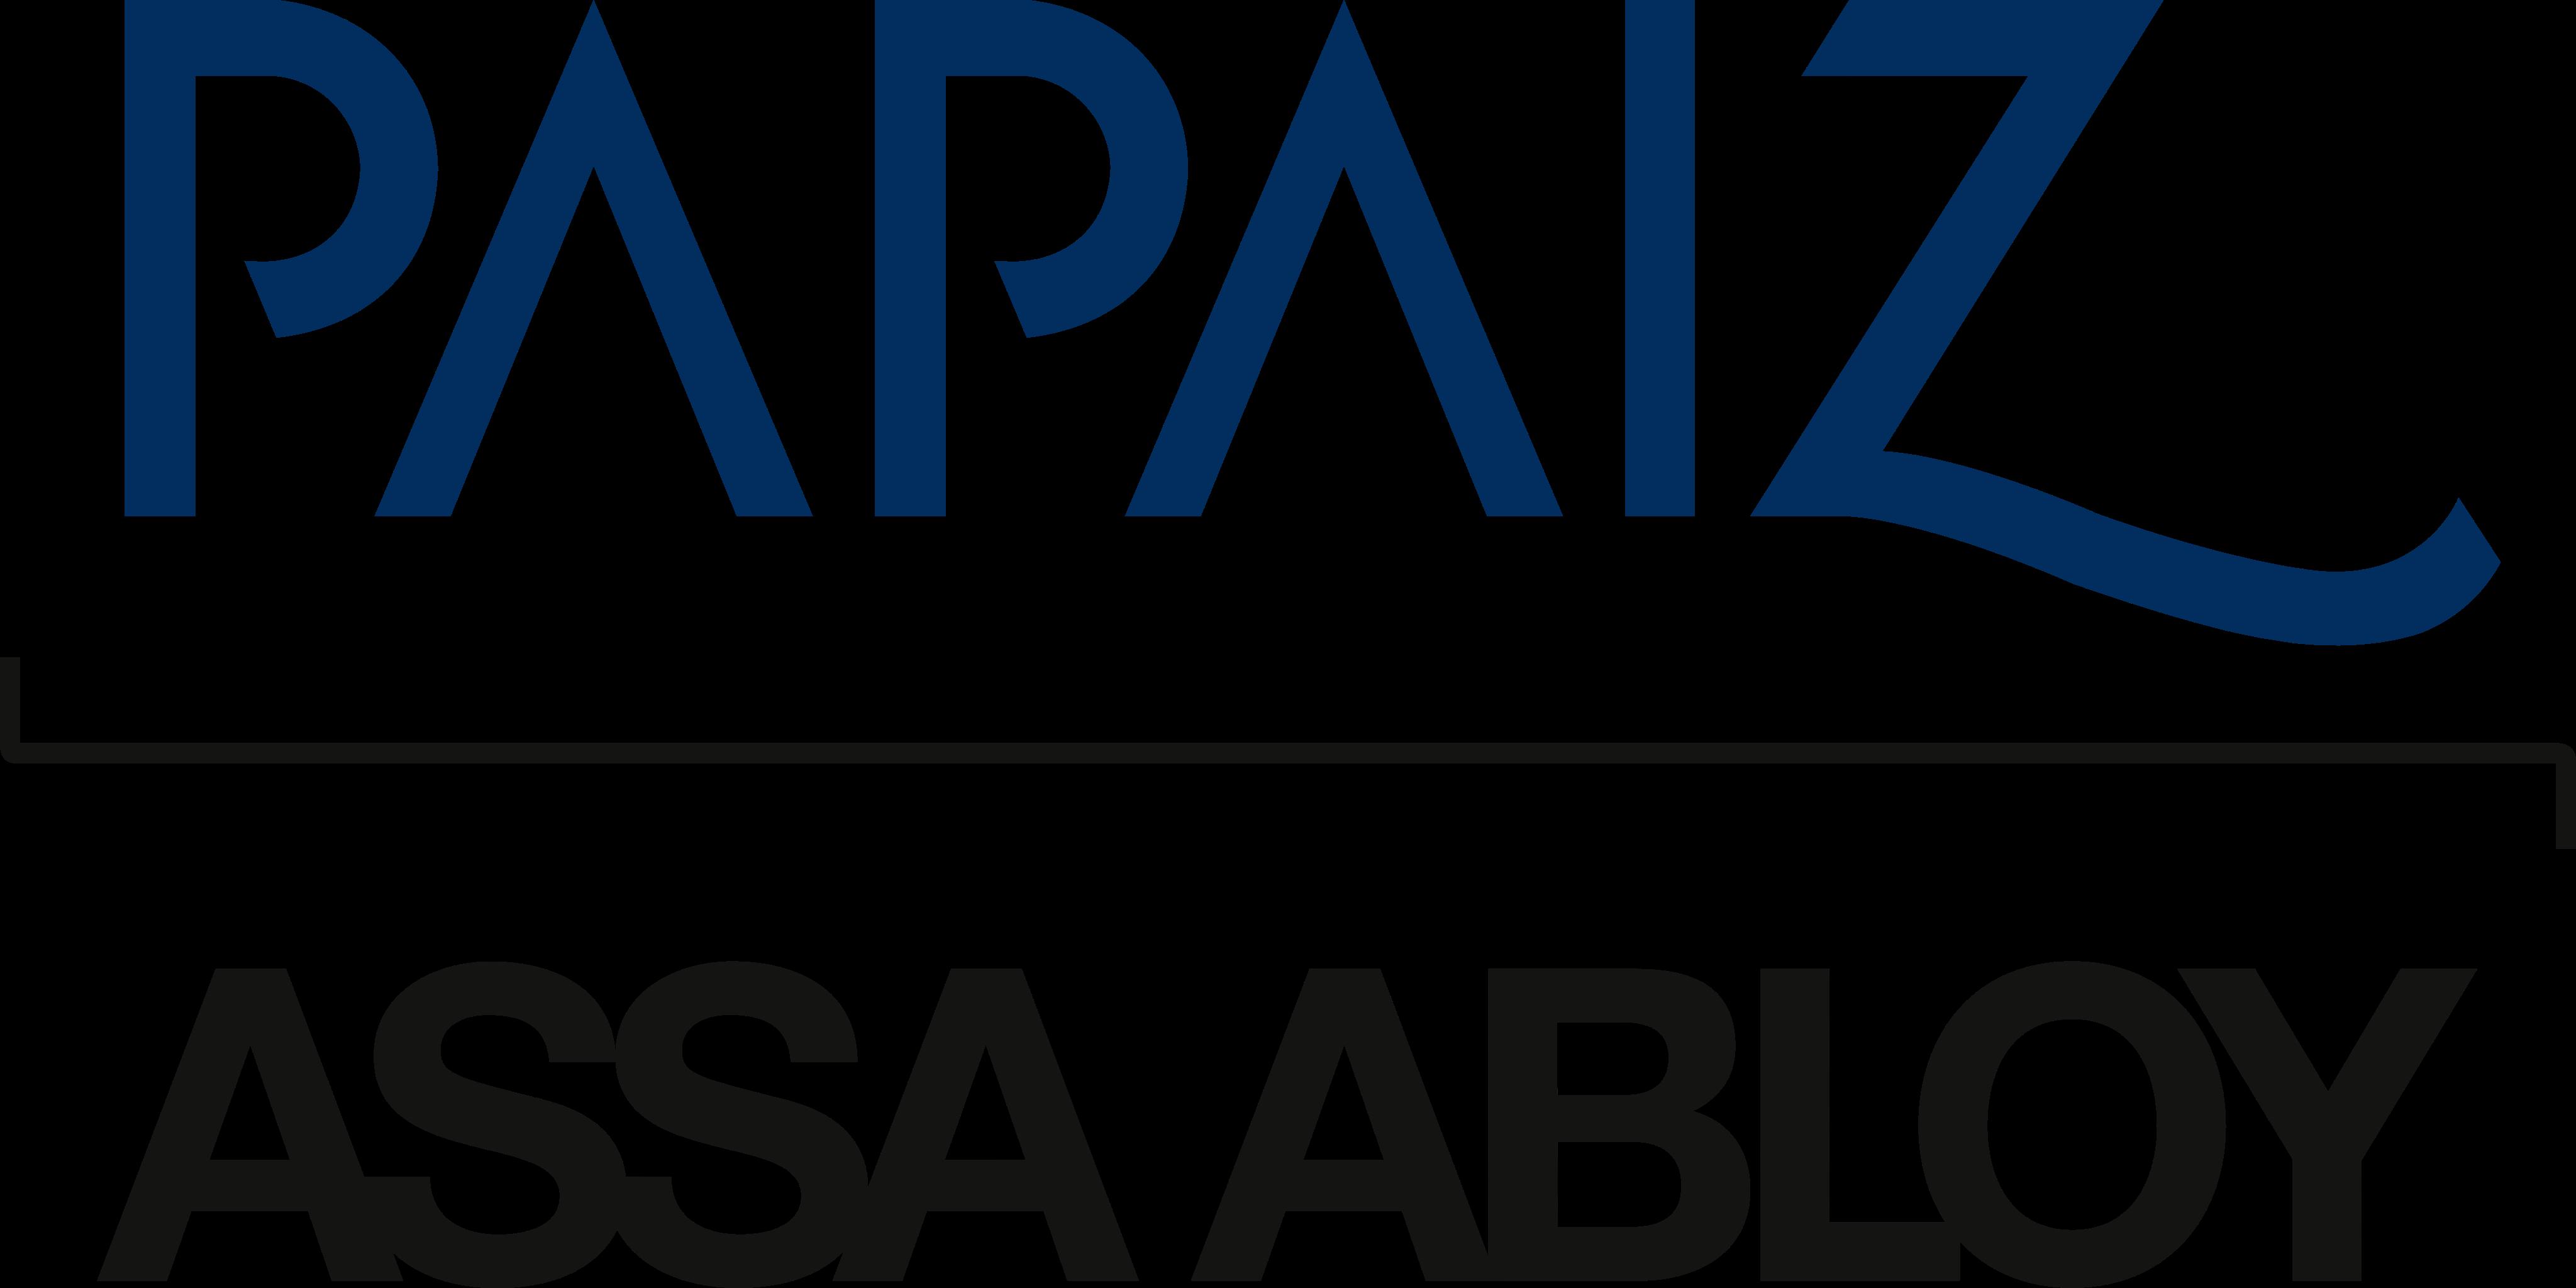 papaiz logo 1 - Papaiz Logo